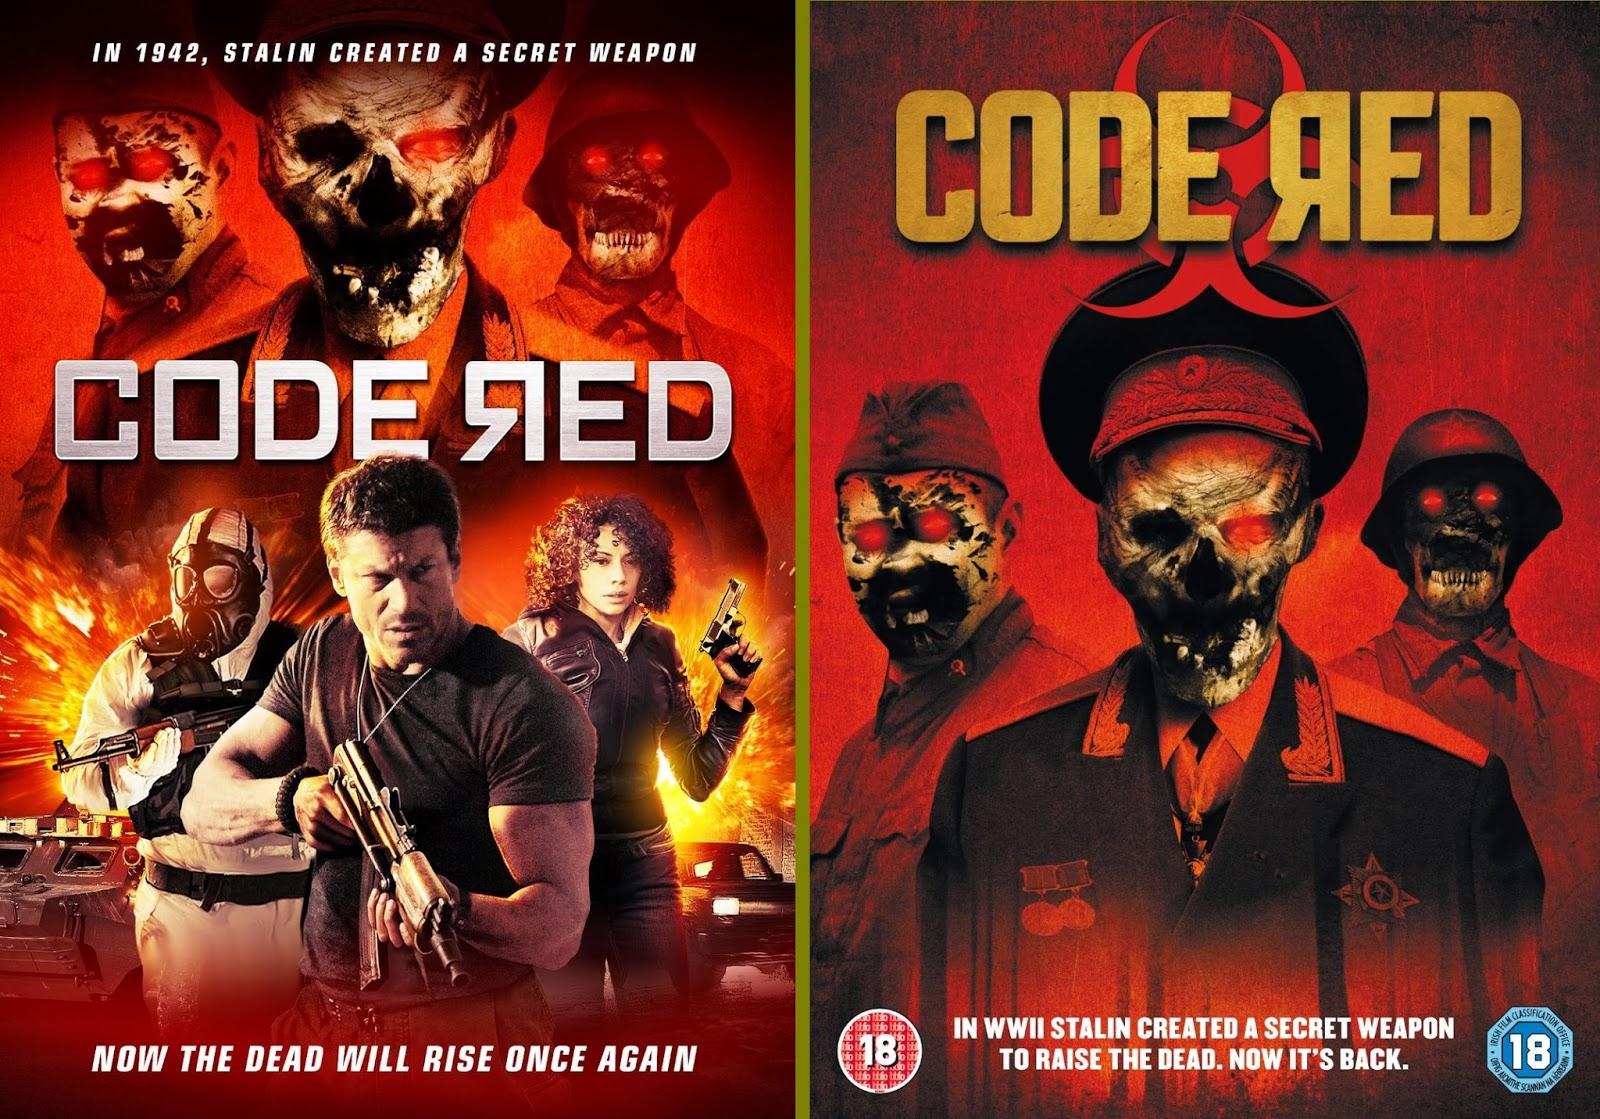 Code+red.jpg